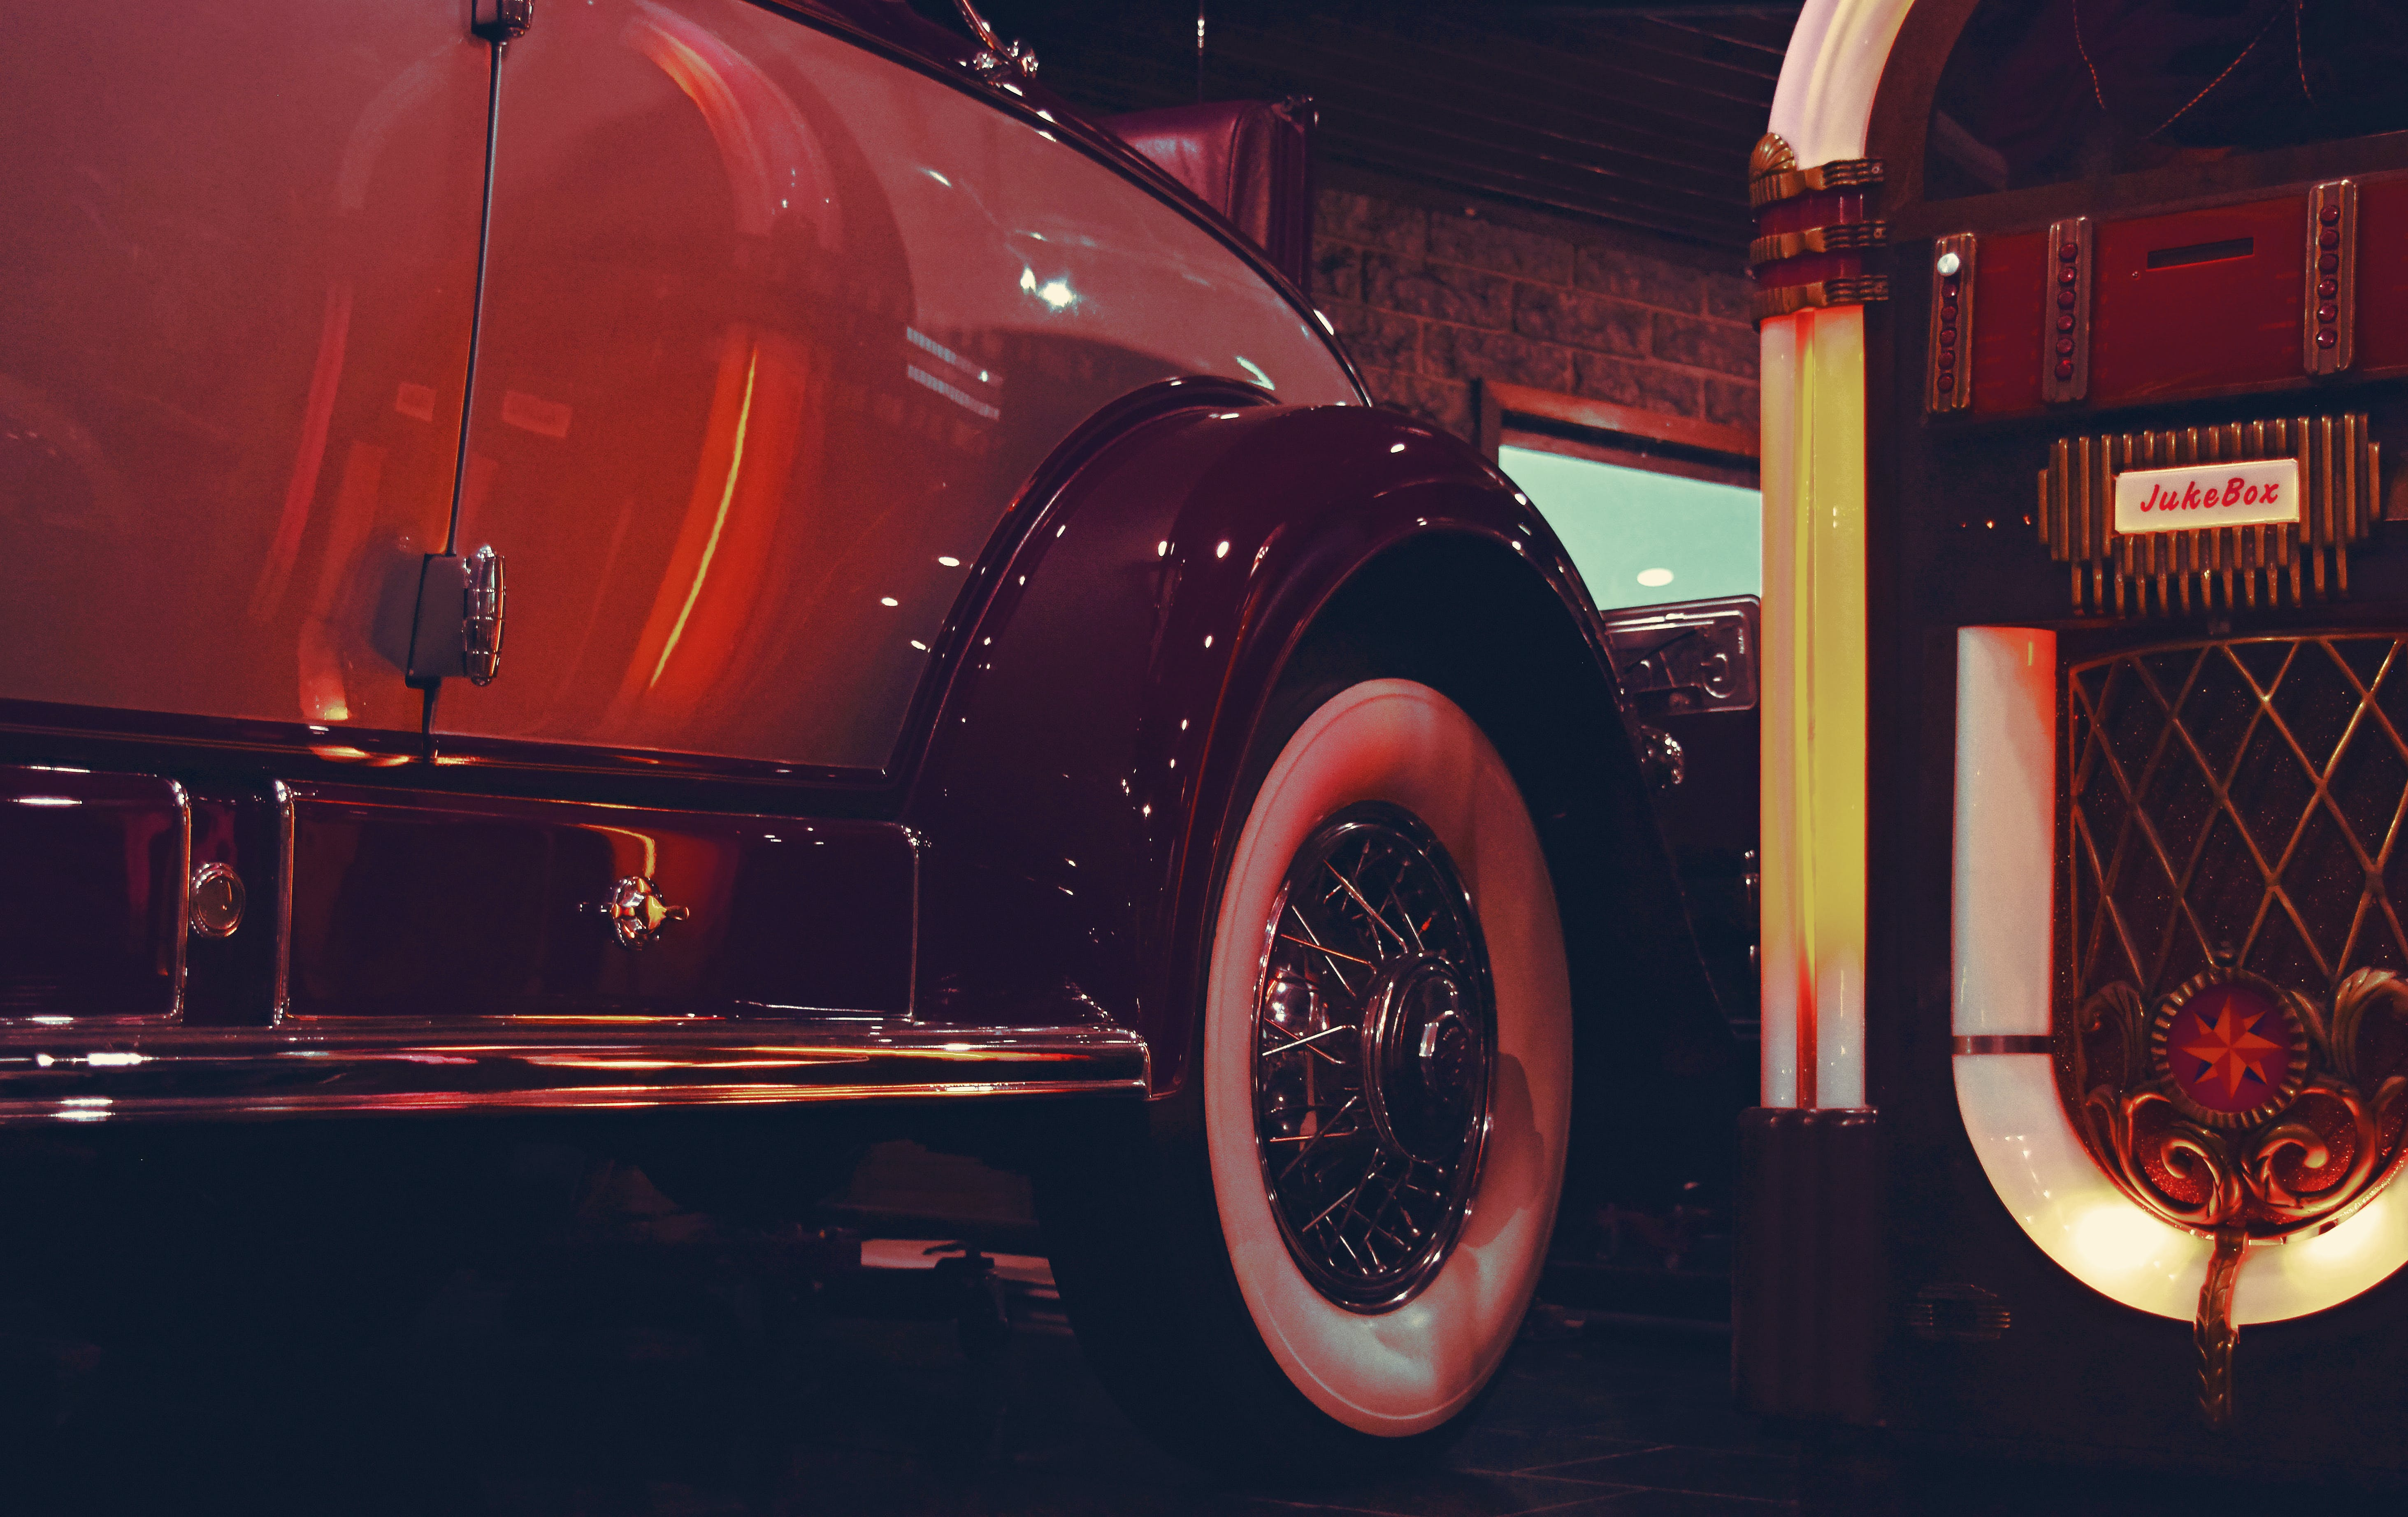 Kostenloses Stock Foto zu altes auto, ausstellung, auto, automobil